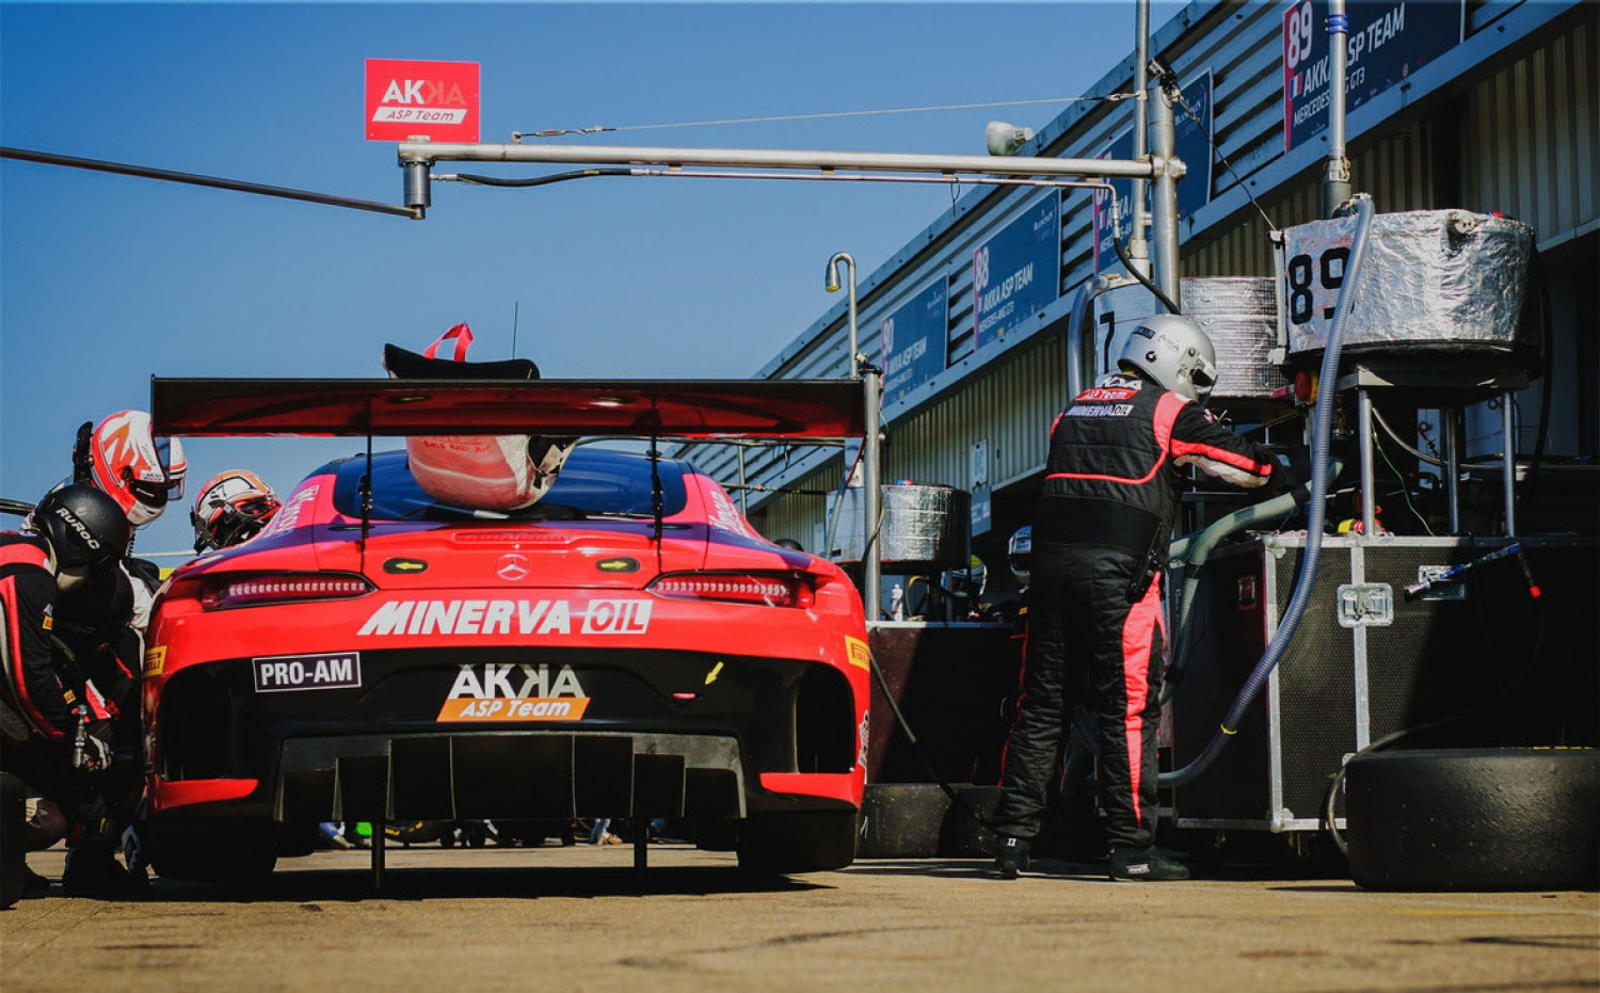 AKKA ASP Team reveals new Pro-Am line-up for full-season Blancpain